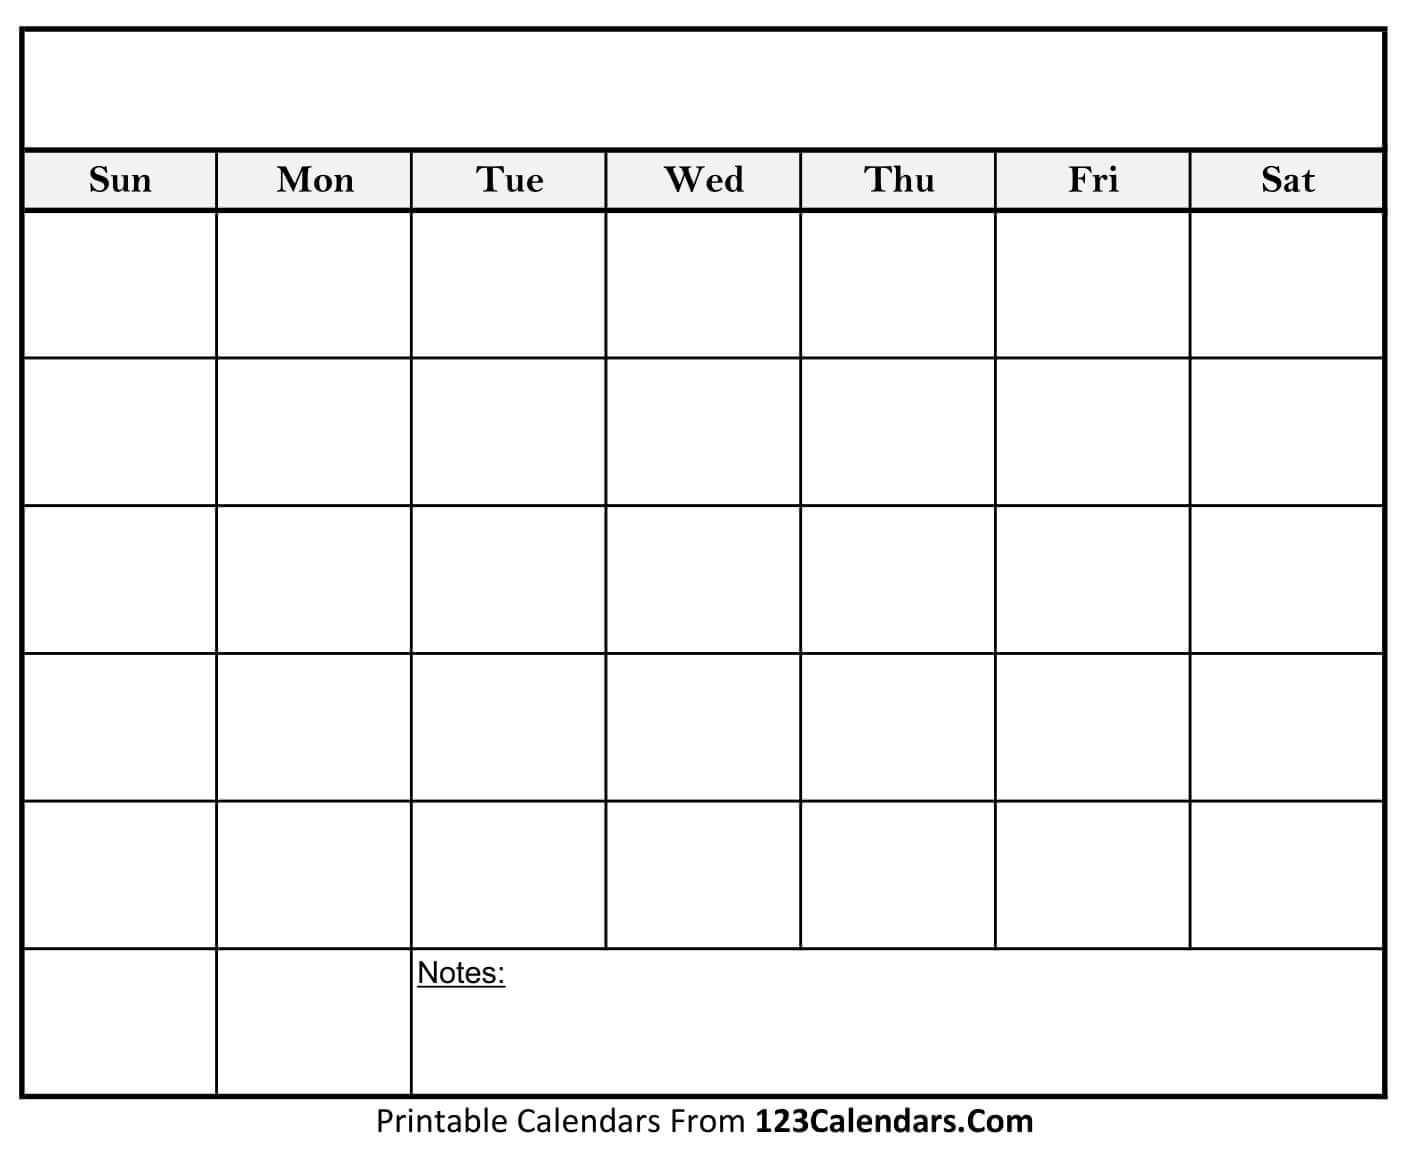 Free Printable Blank Calendar | 123Calendars With Regard To Full Page Blank Calendar Template